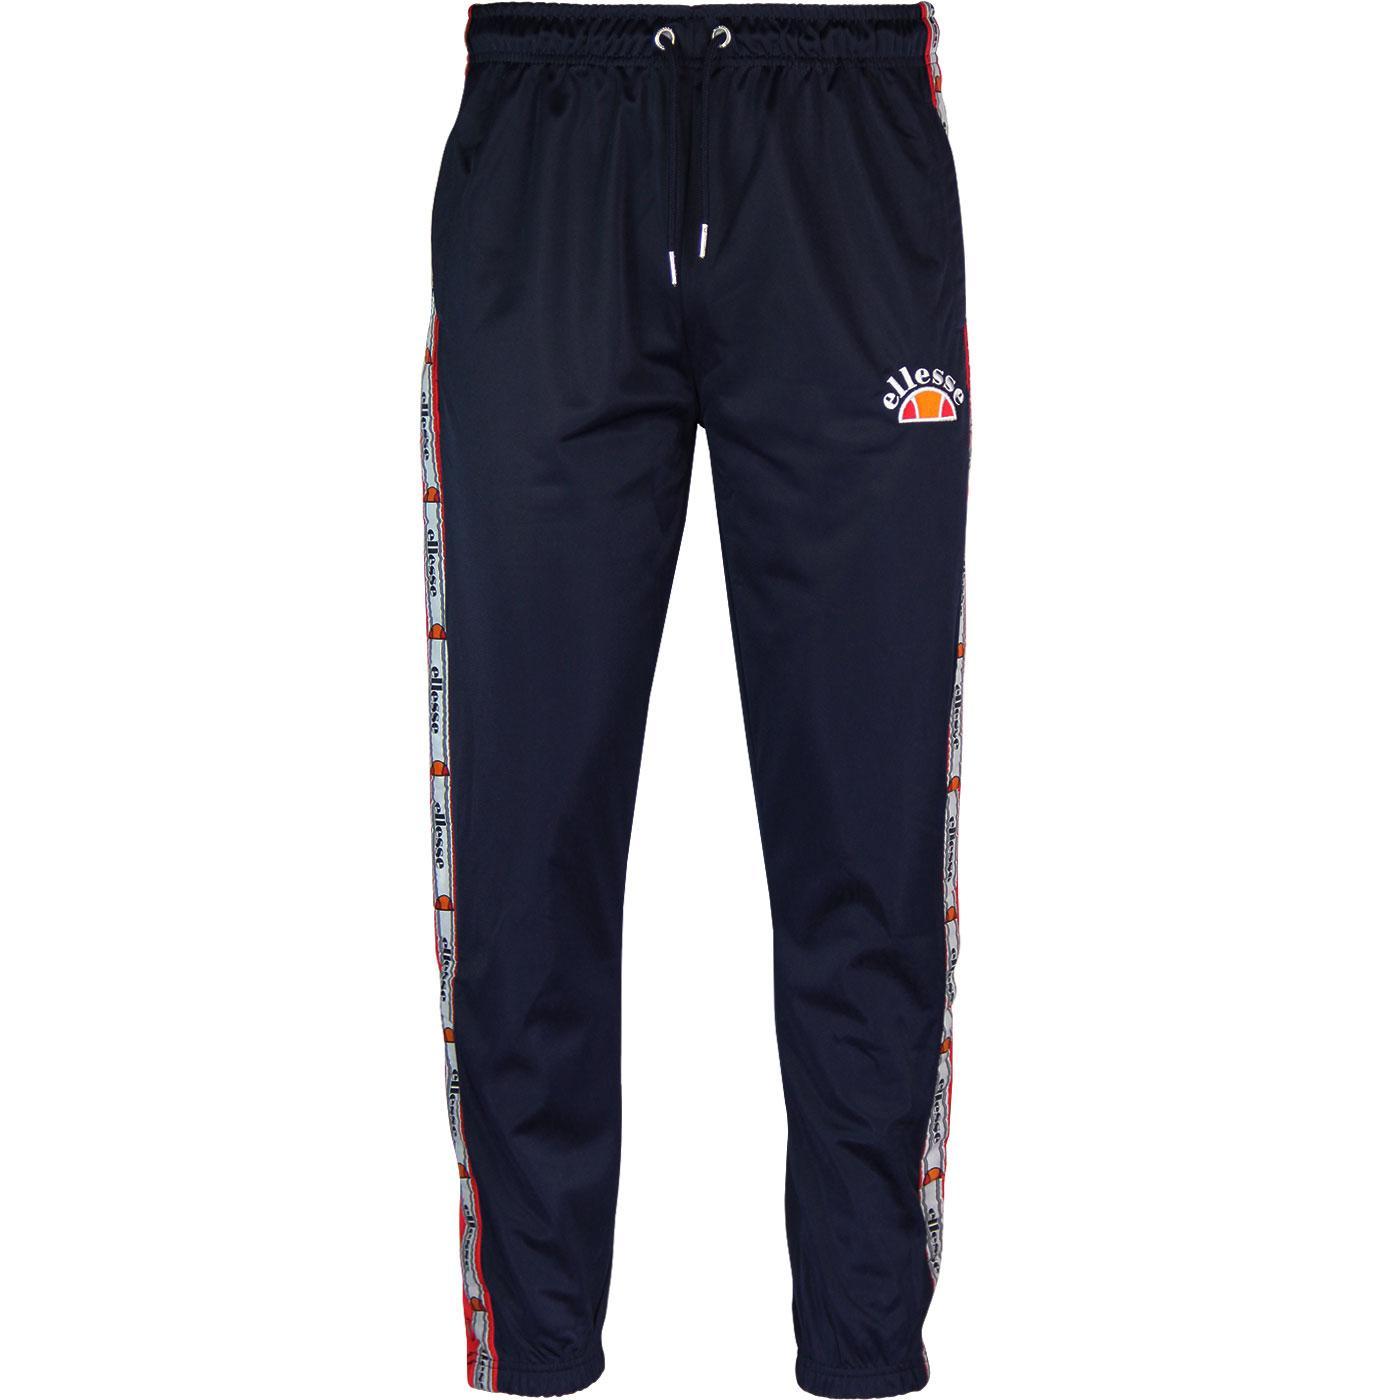 Prezza ELLESSE Retro 80s Taped Popper Pants (Navy)